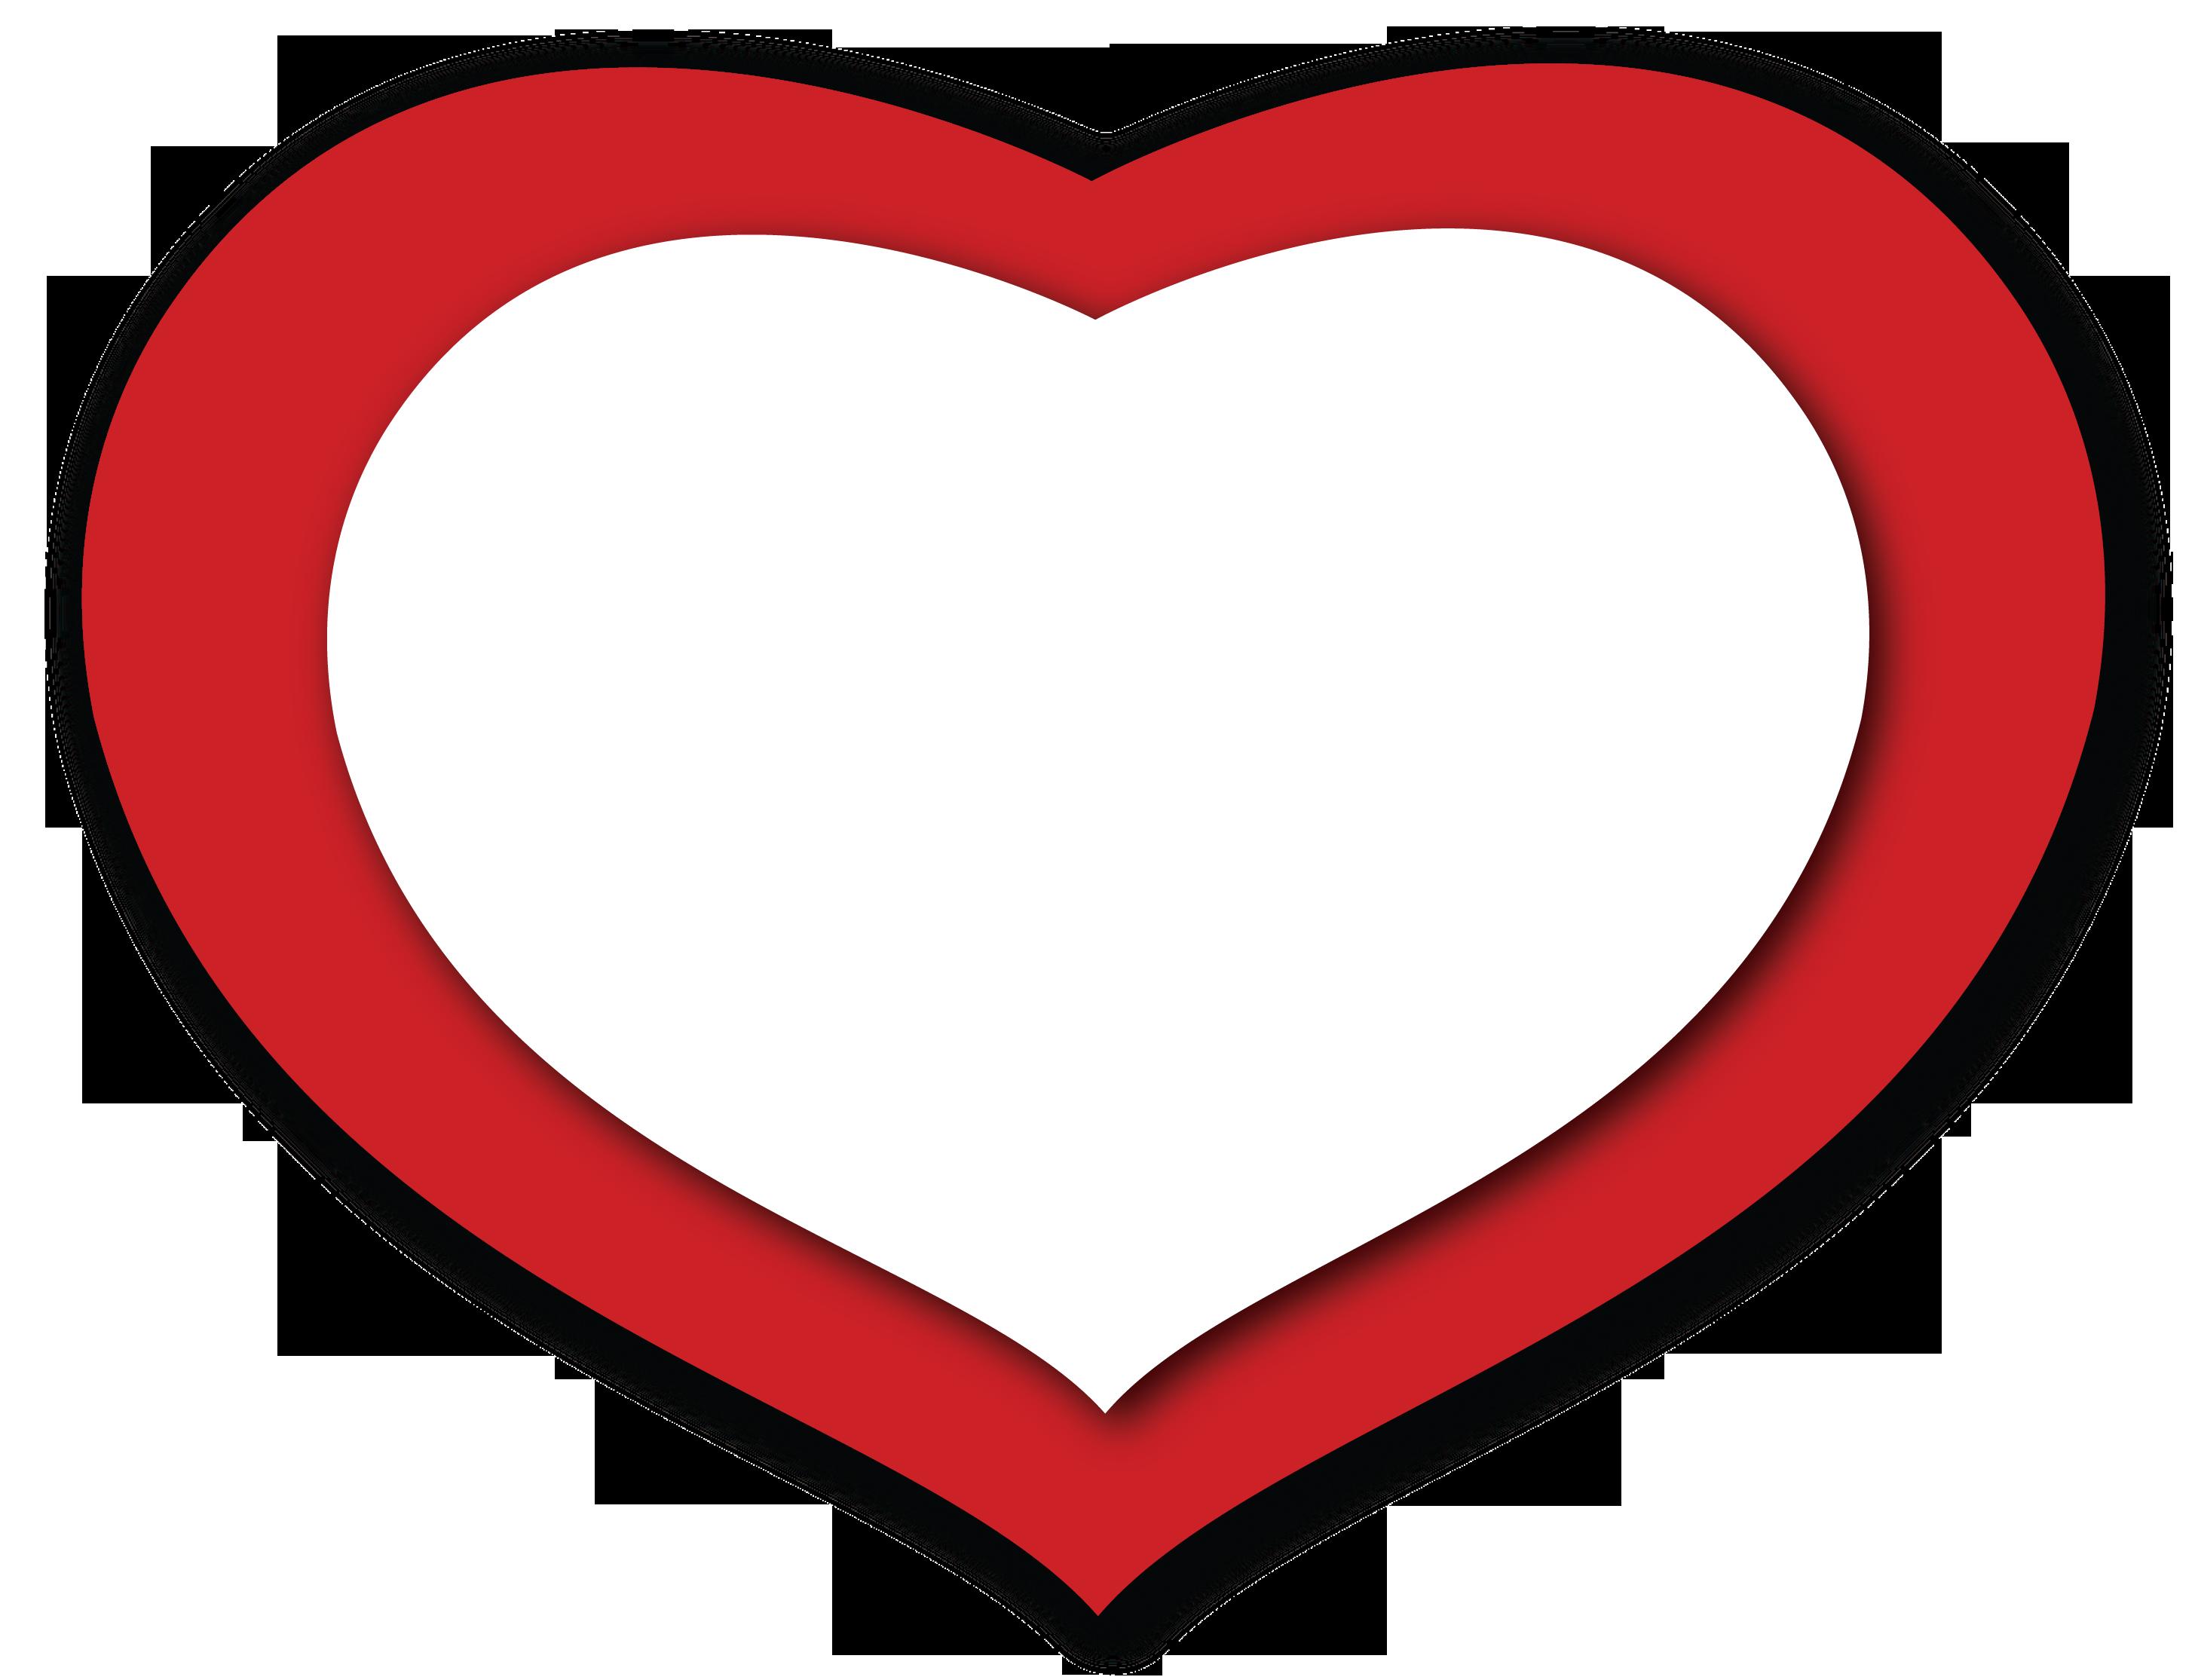 Transparent Red Heart PNG Clipart 쉬운 그림 그리기, 그림 그리기, 그림